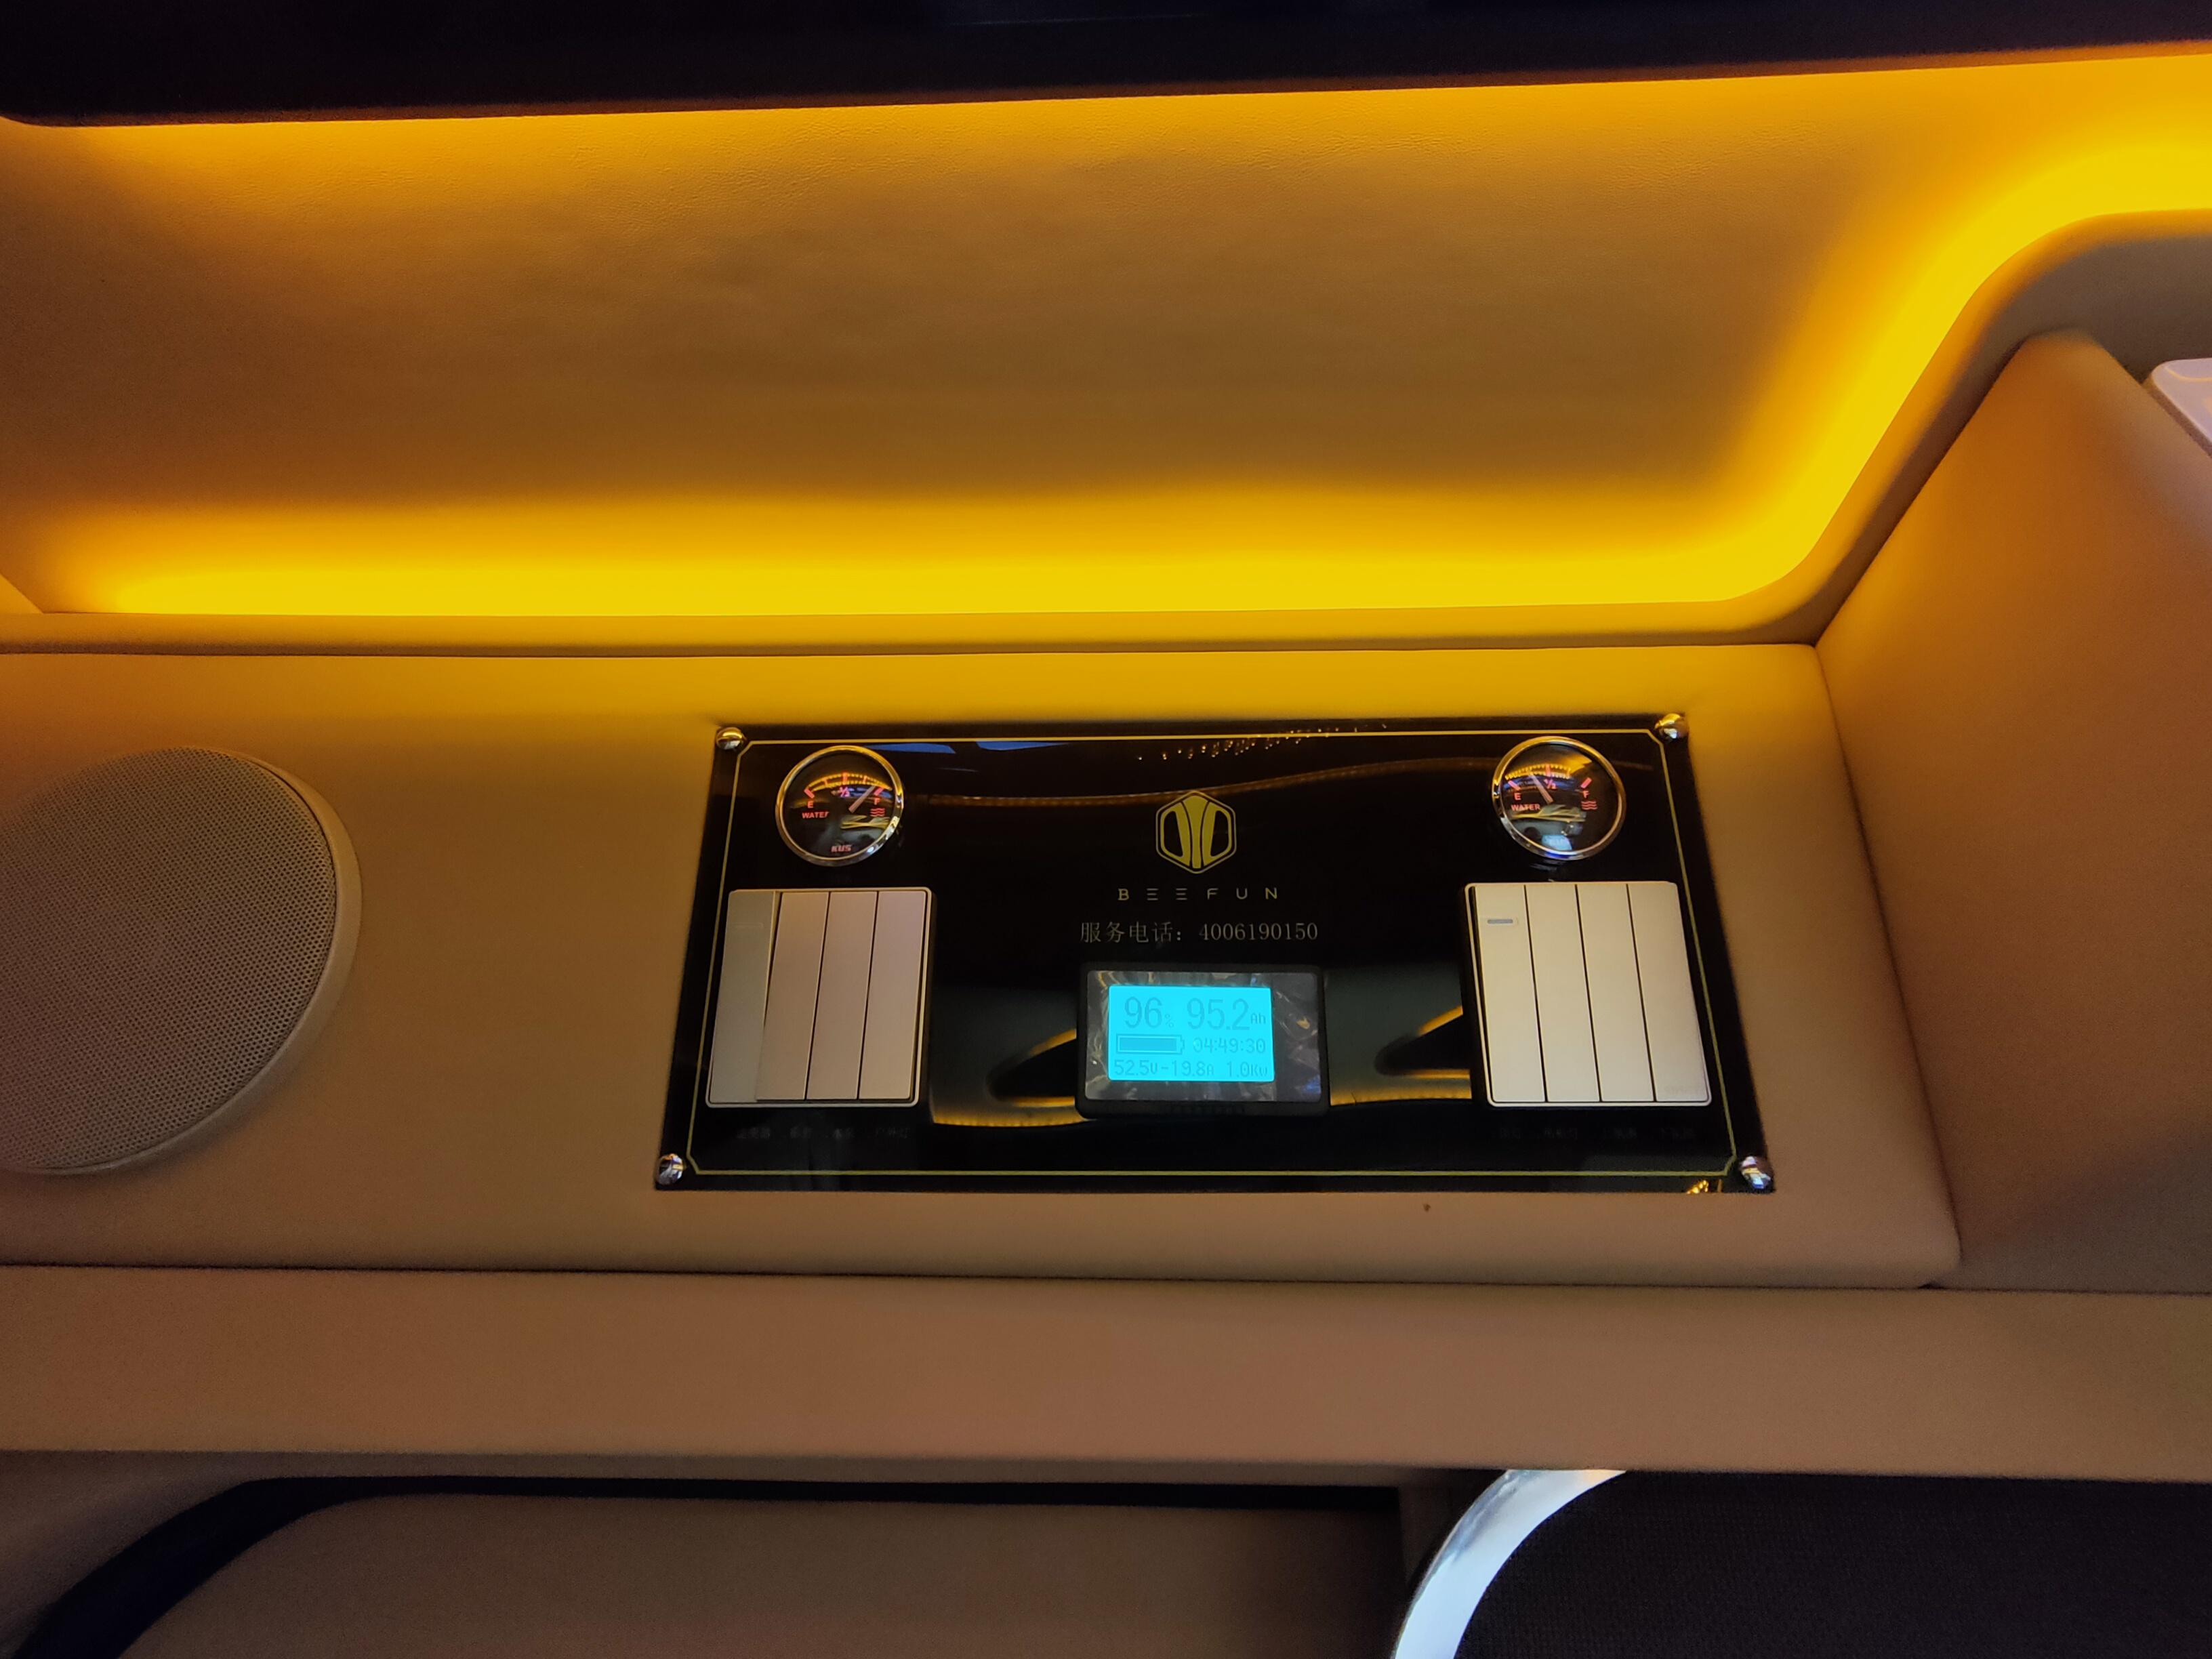 48V房车电路系统加持,趣蜂福特全顺新世代商旅房车最新款发布